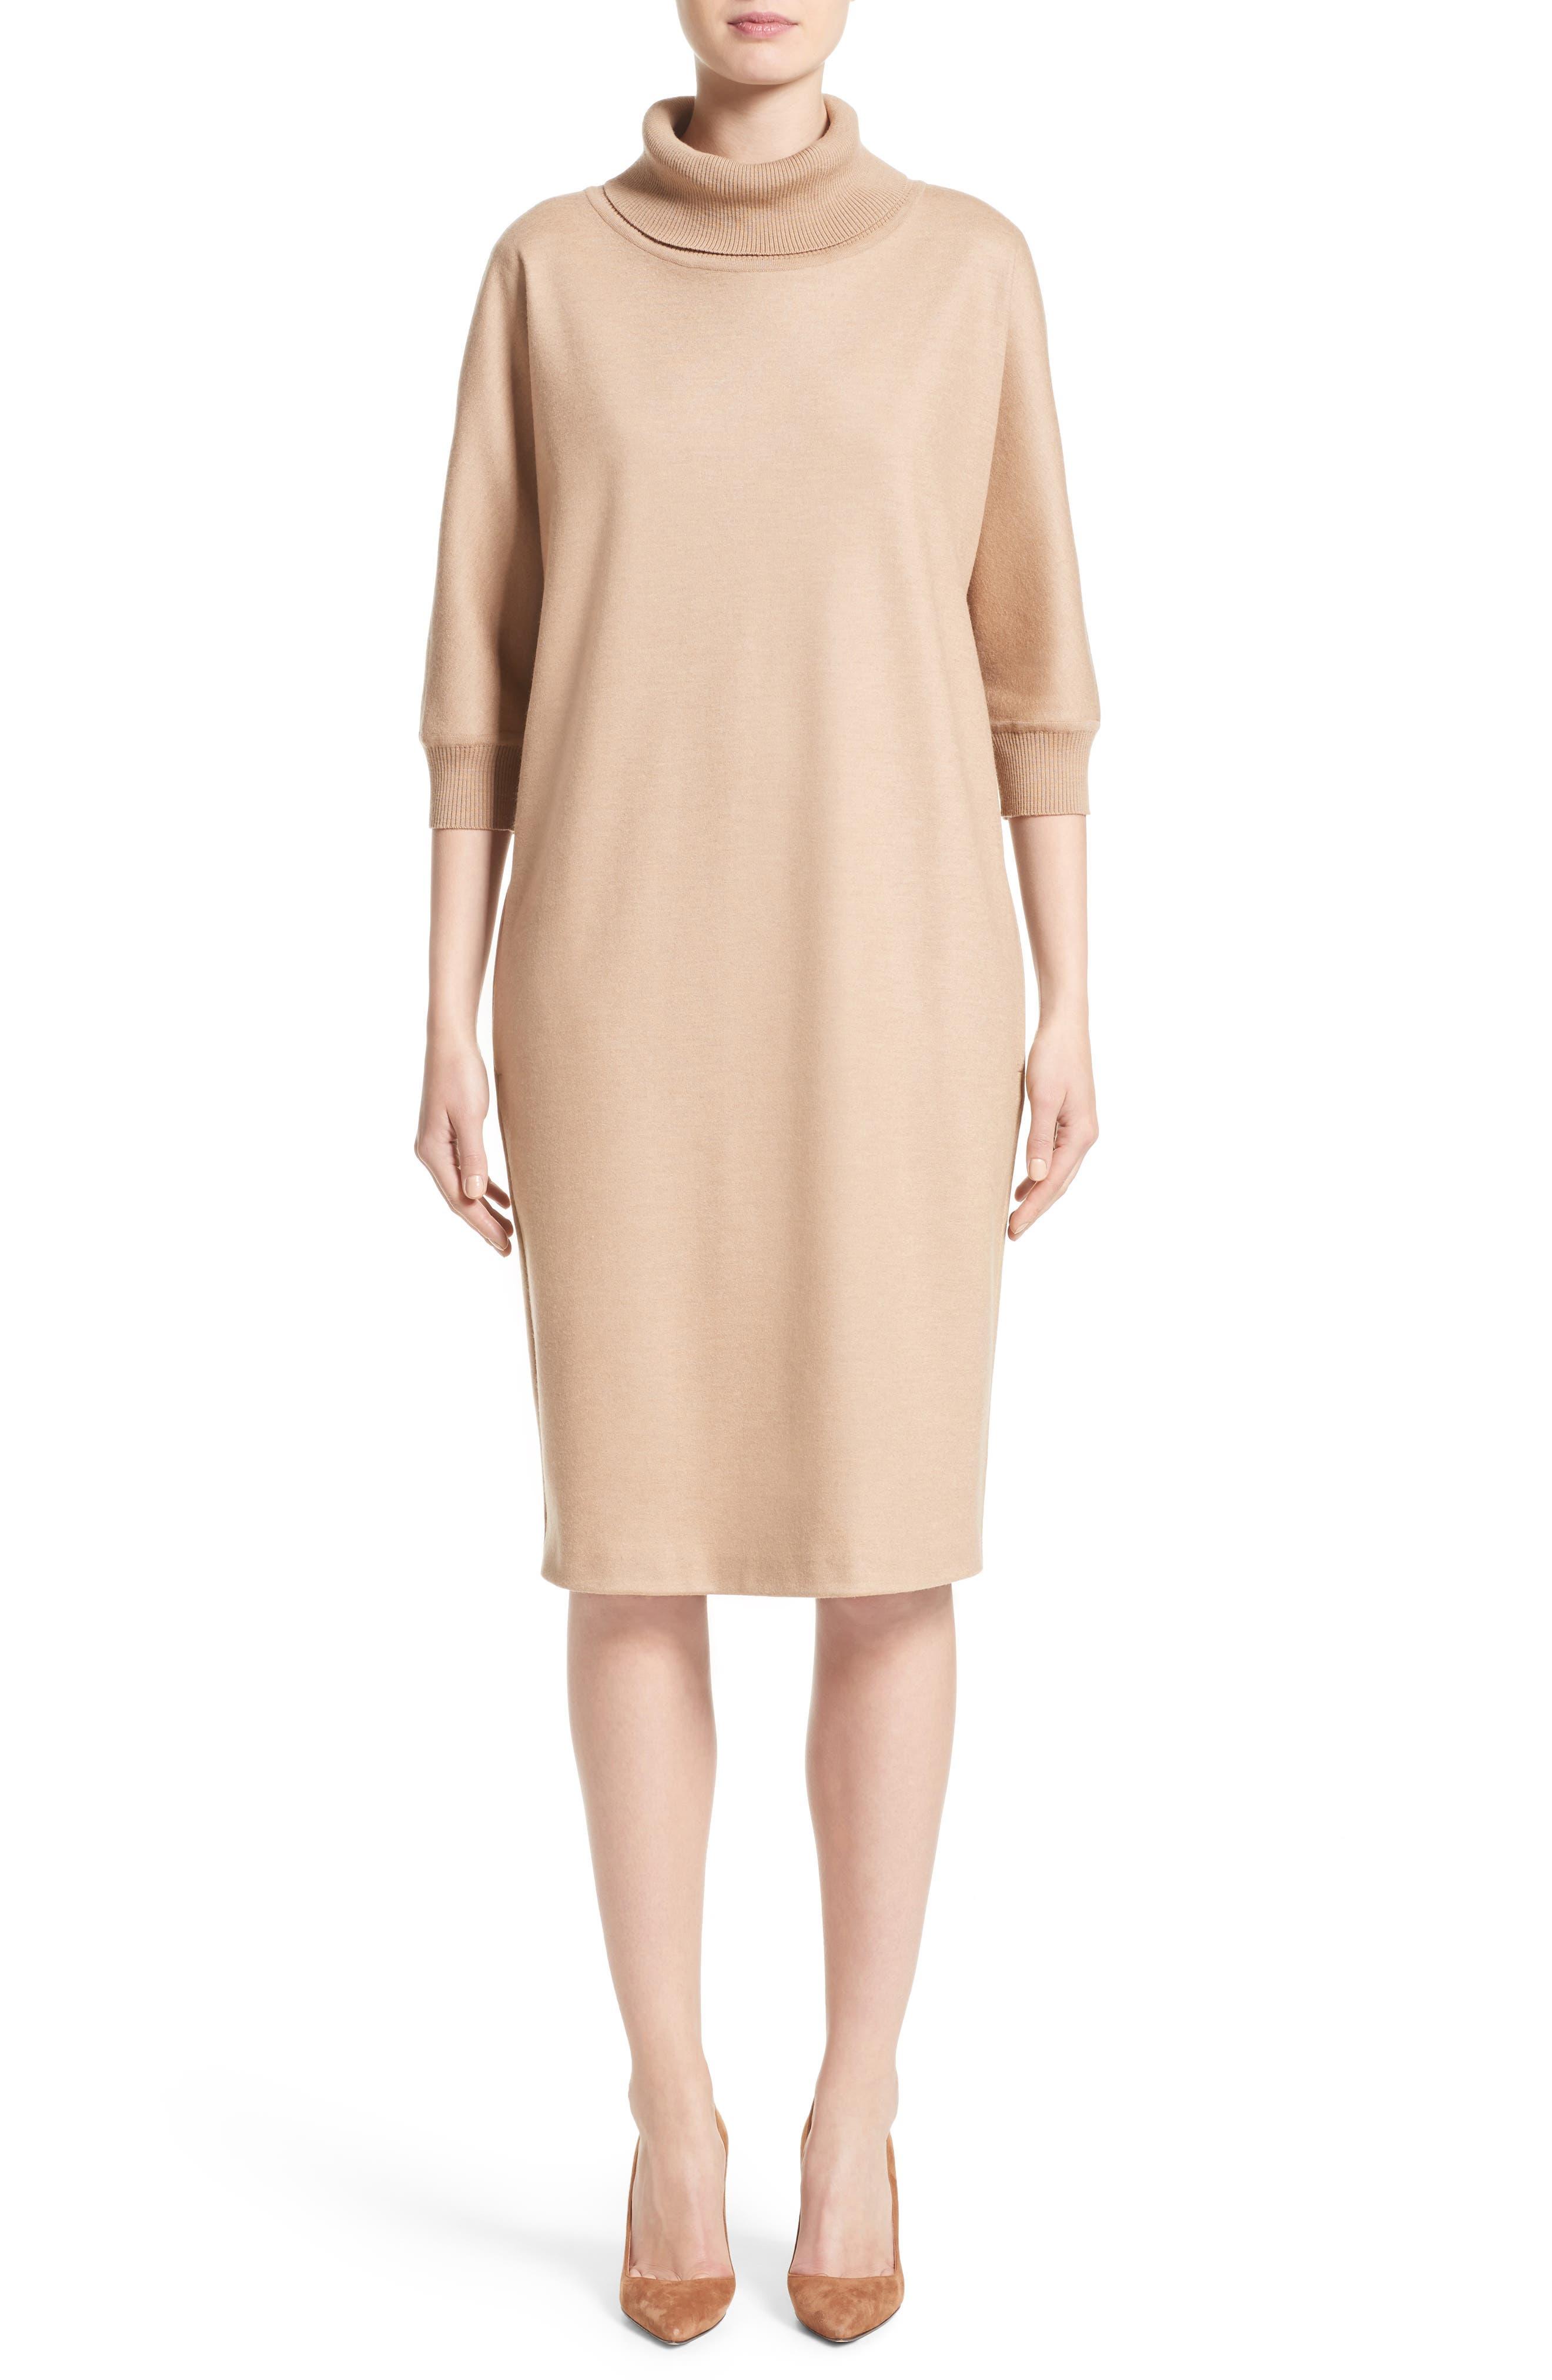 Main Image - Max Mara Agro Wool Turtleneck Dress